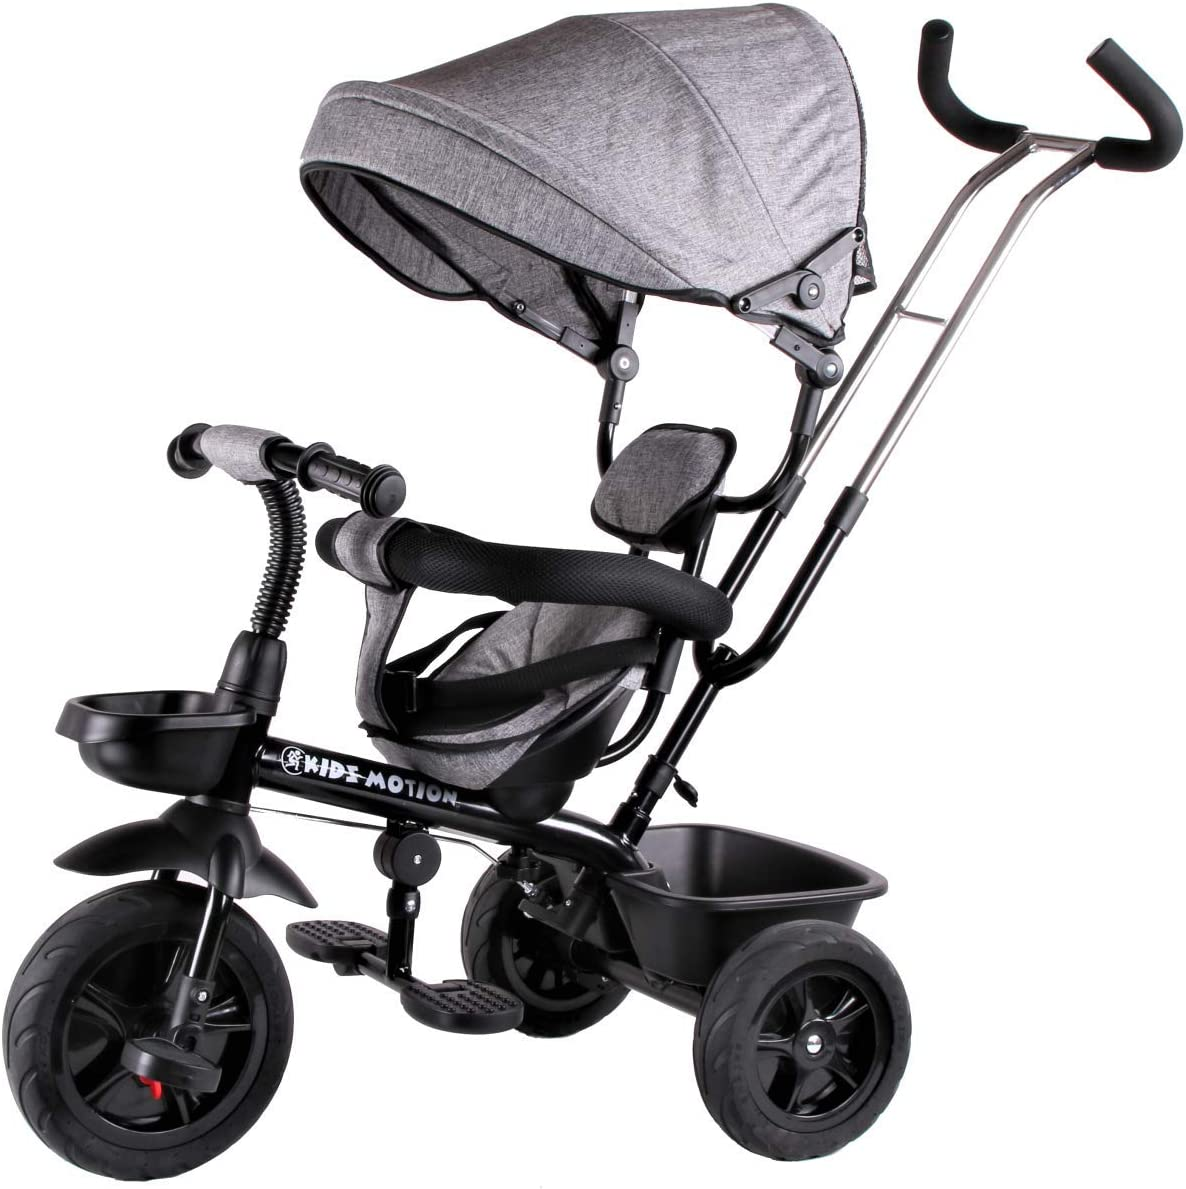 Kidz Motion Bicicleta Triciclo Infantil Para Bebés Giratorio De 9 meses a 5 años